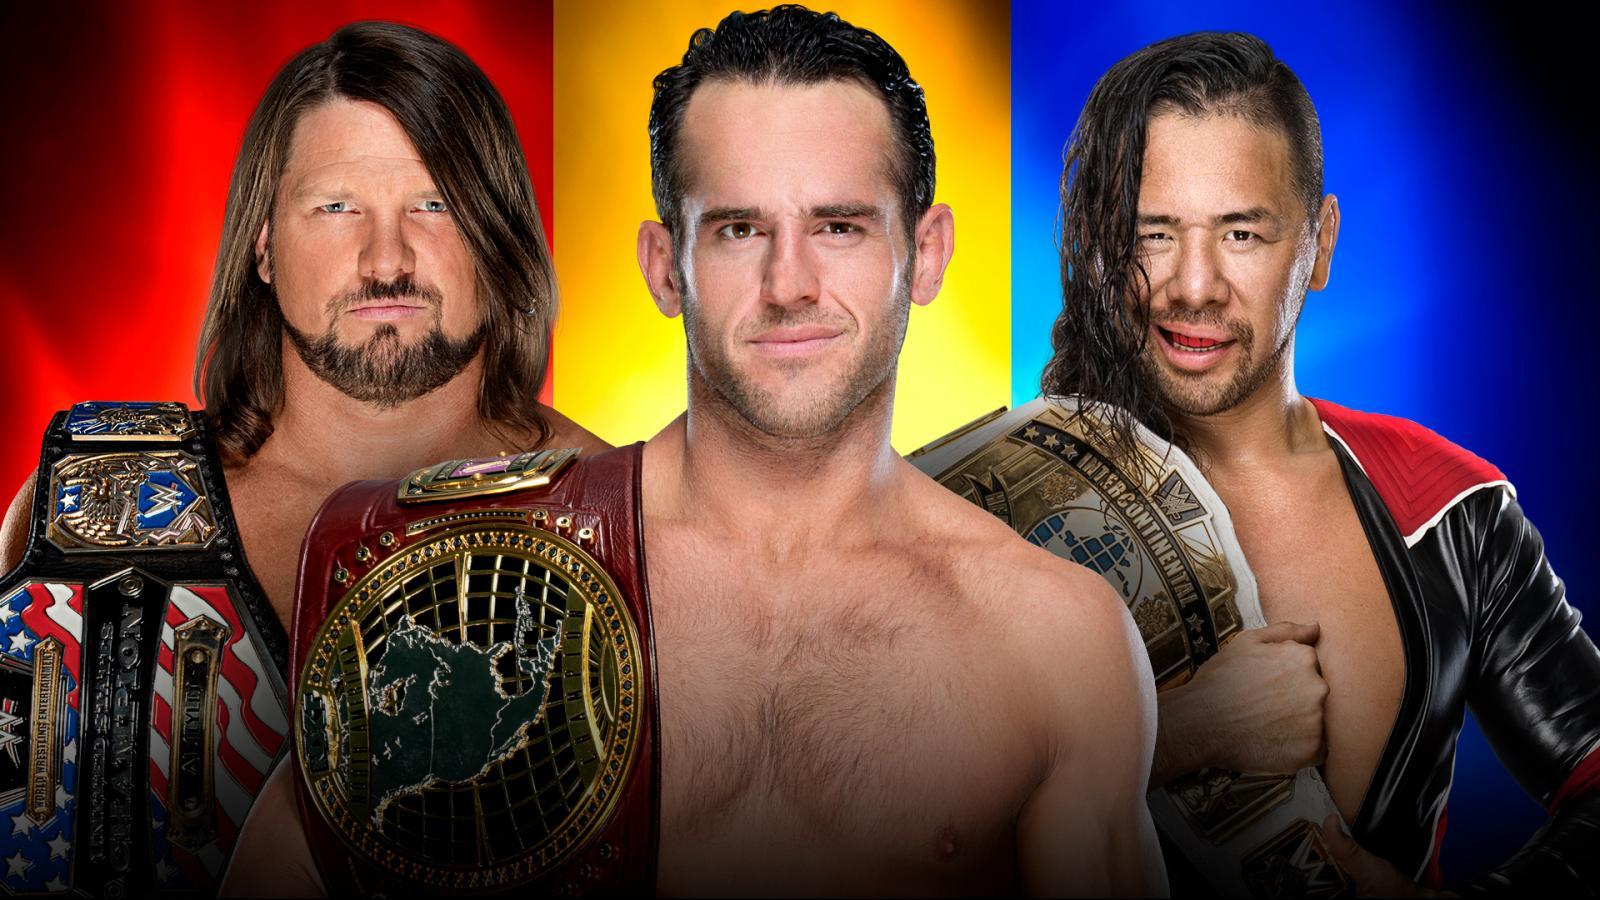 Roderick Strong vs AJ Styles vs Shinsuke Nakamura